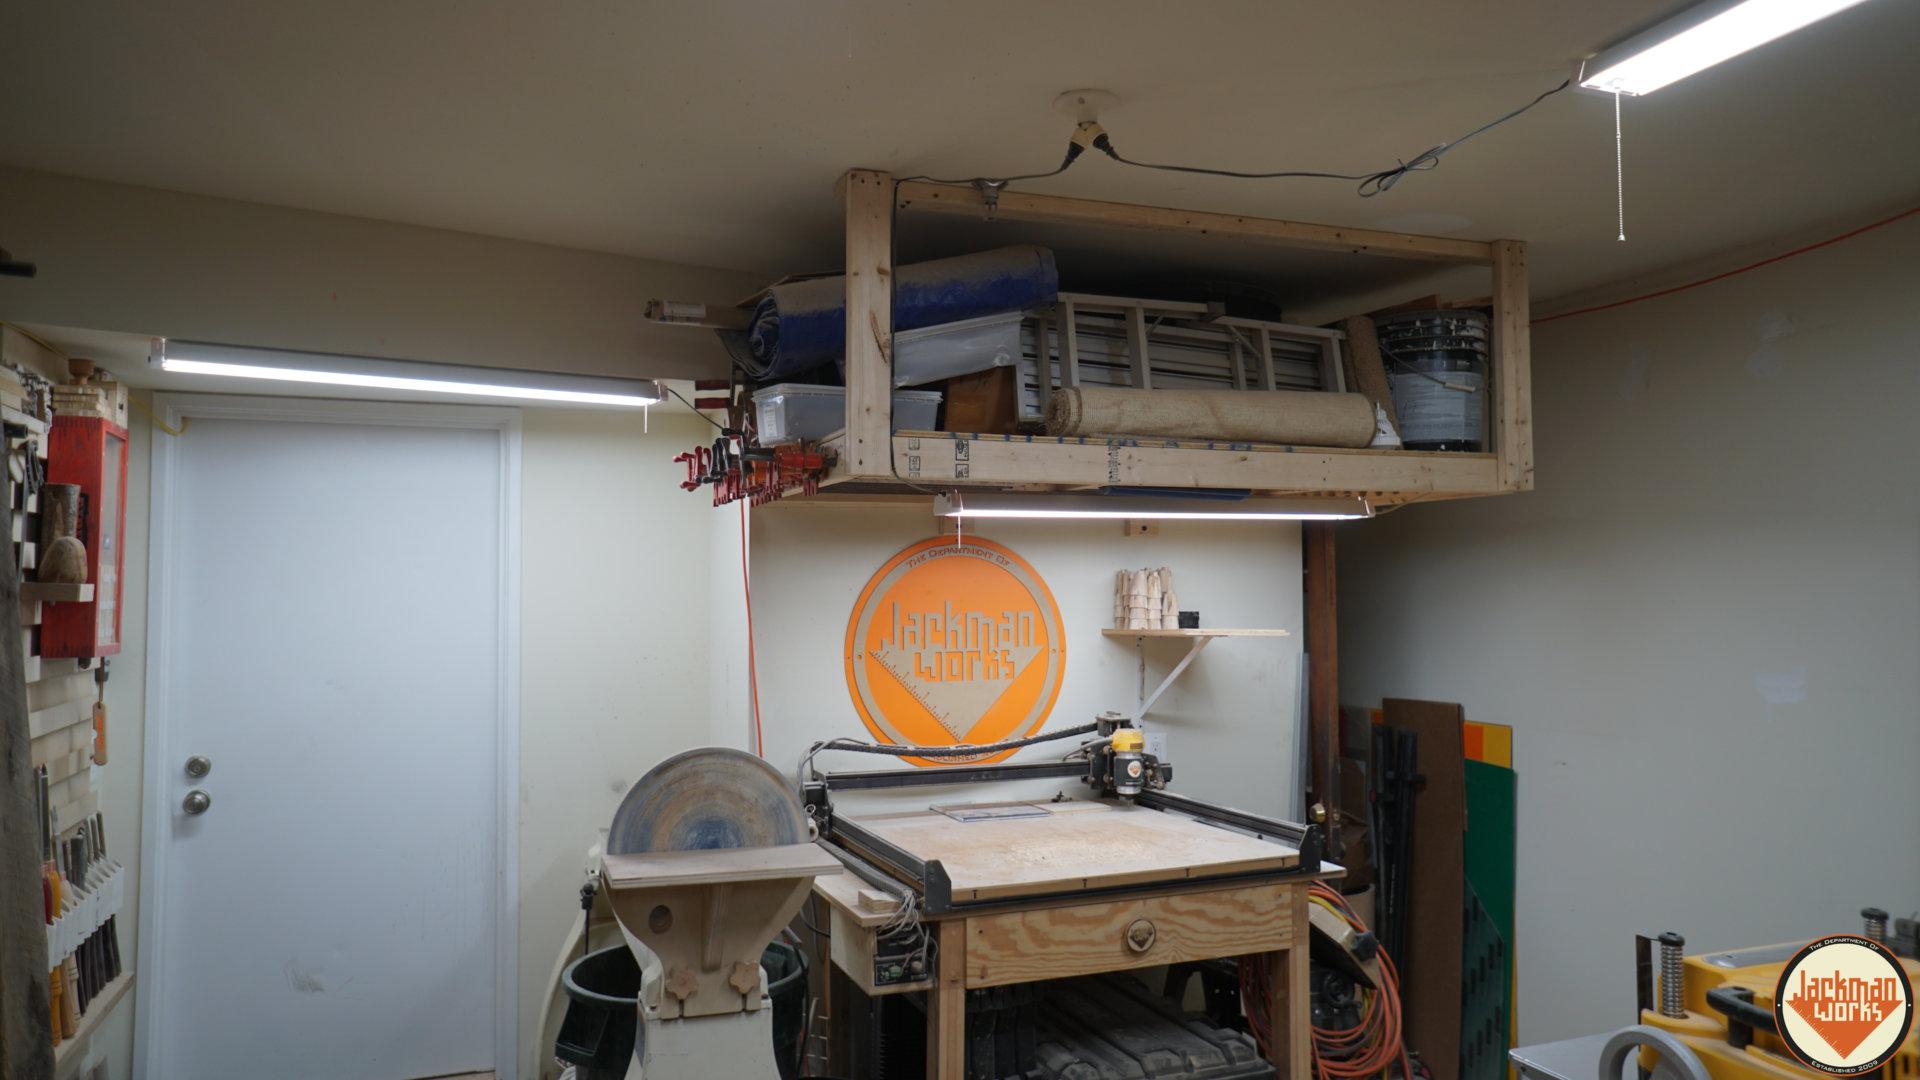 floating garage storage loft and clamp rack 25 - Jackman Works